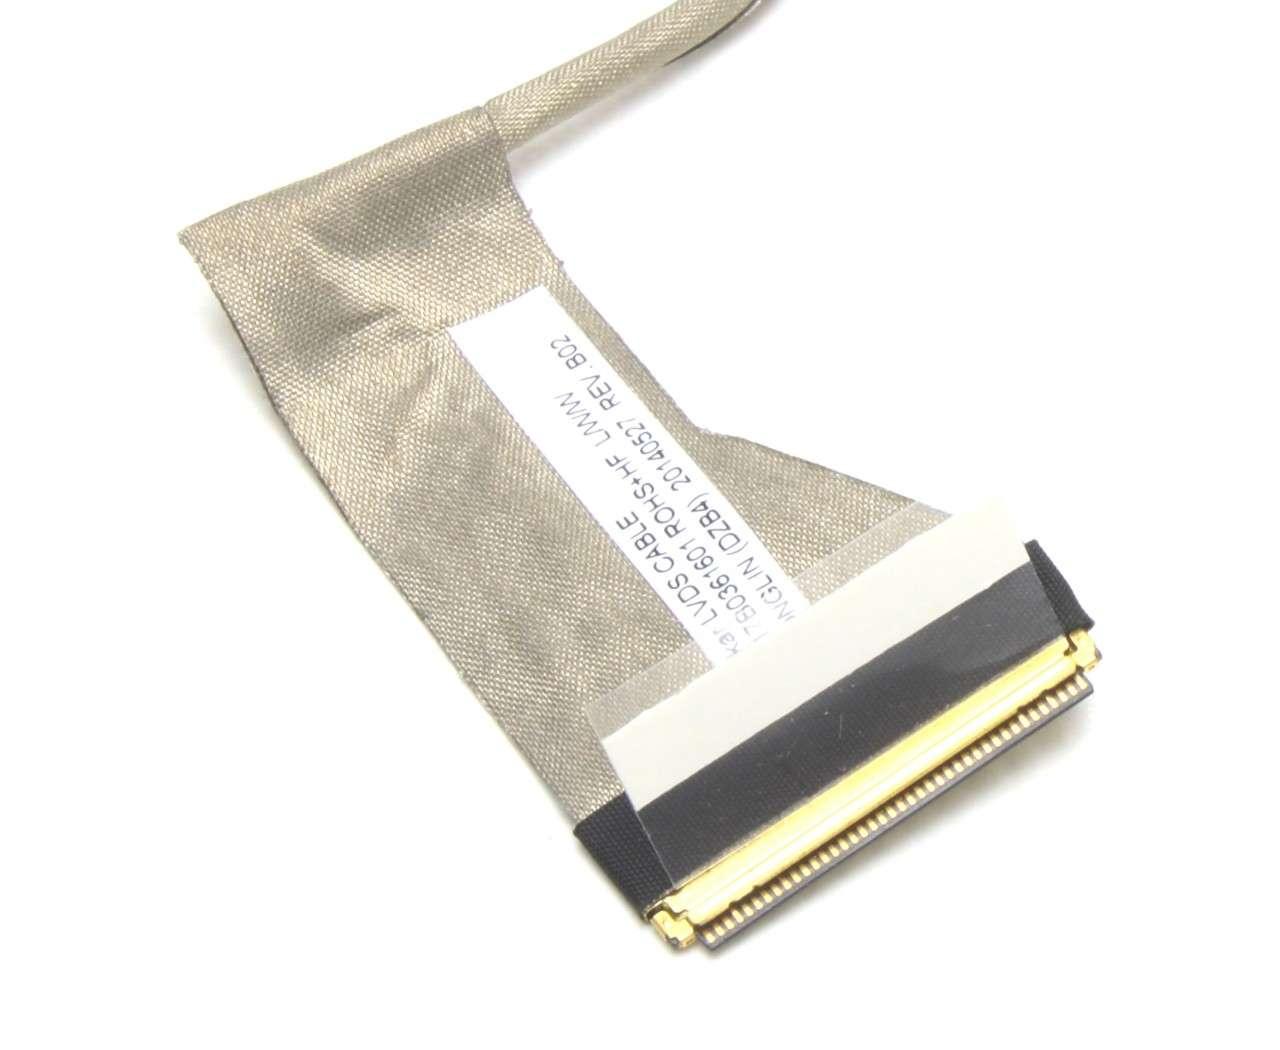 Cablu video LVDS Toshiba Satellite C855D Part Number 6017B0361601 imagine powerlaptop.ro 2021